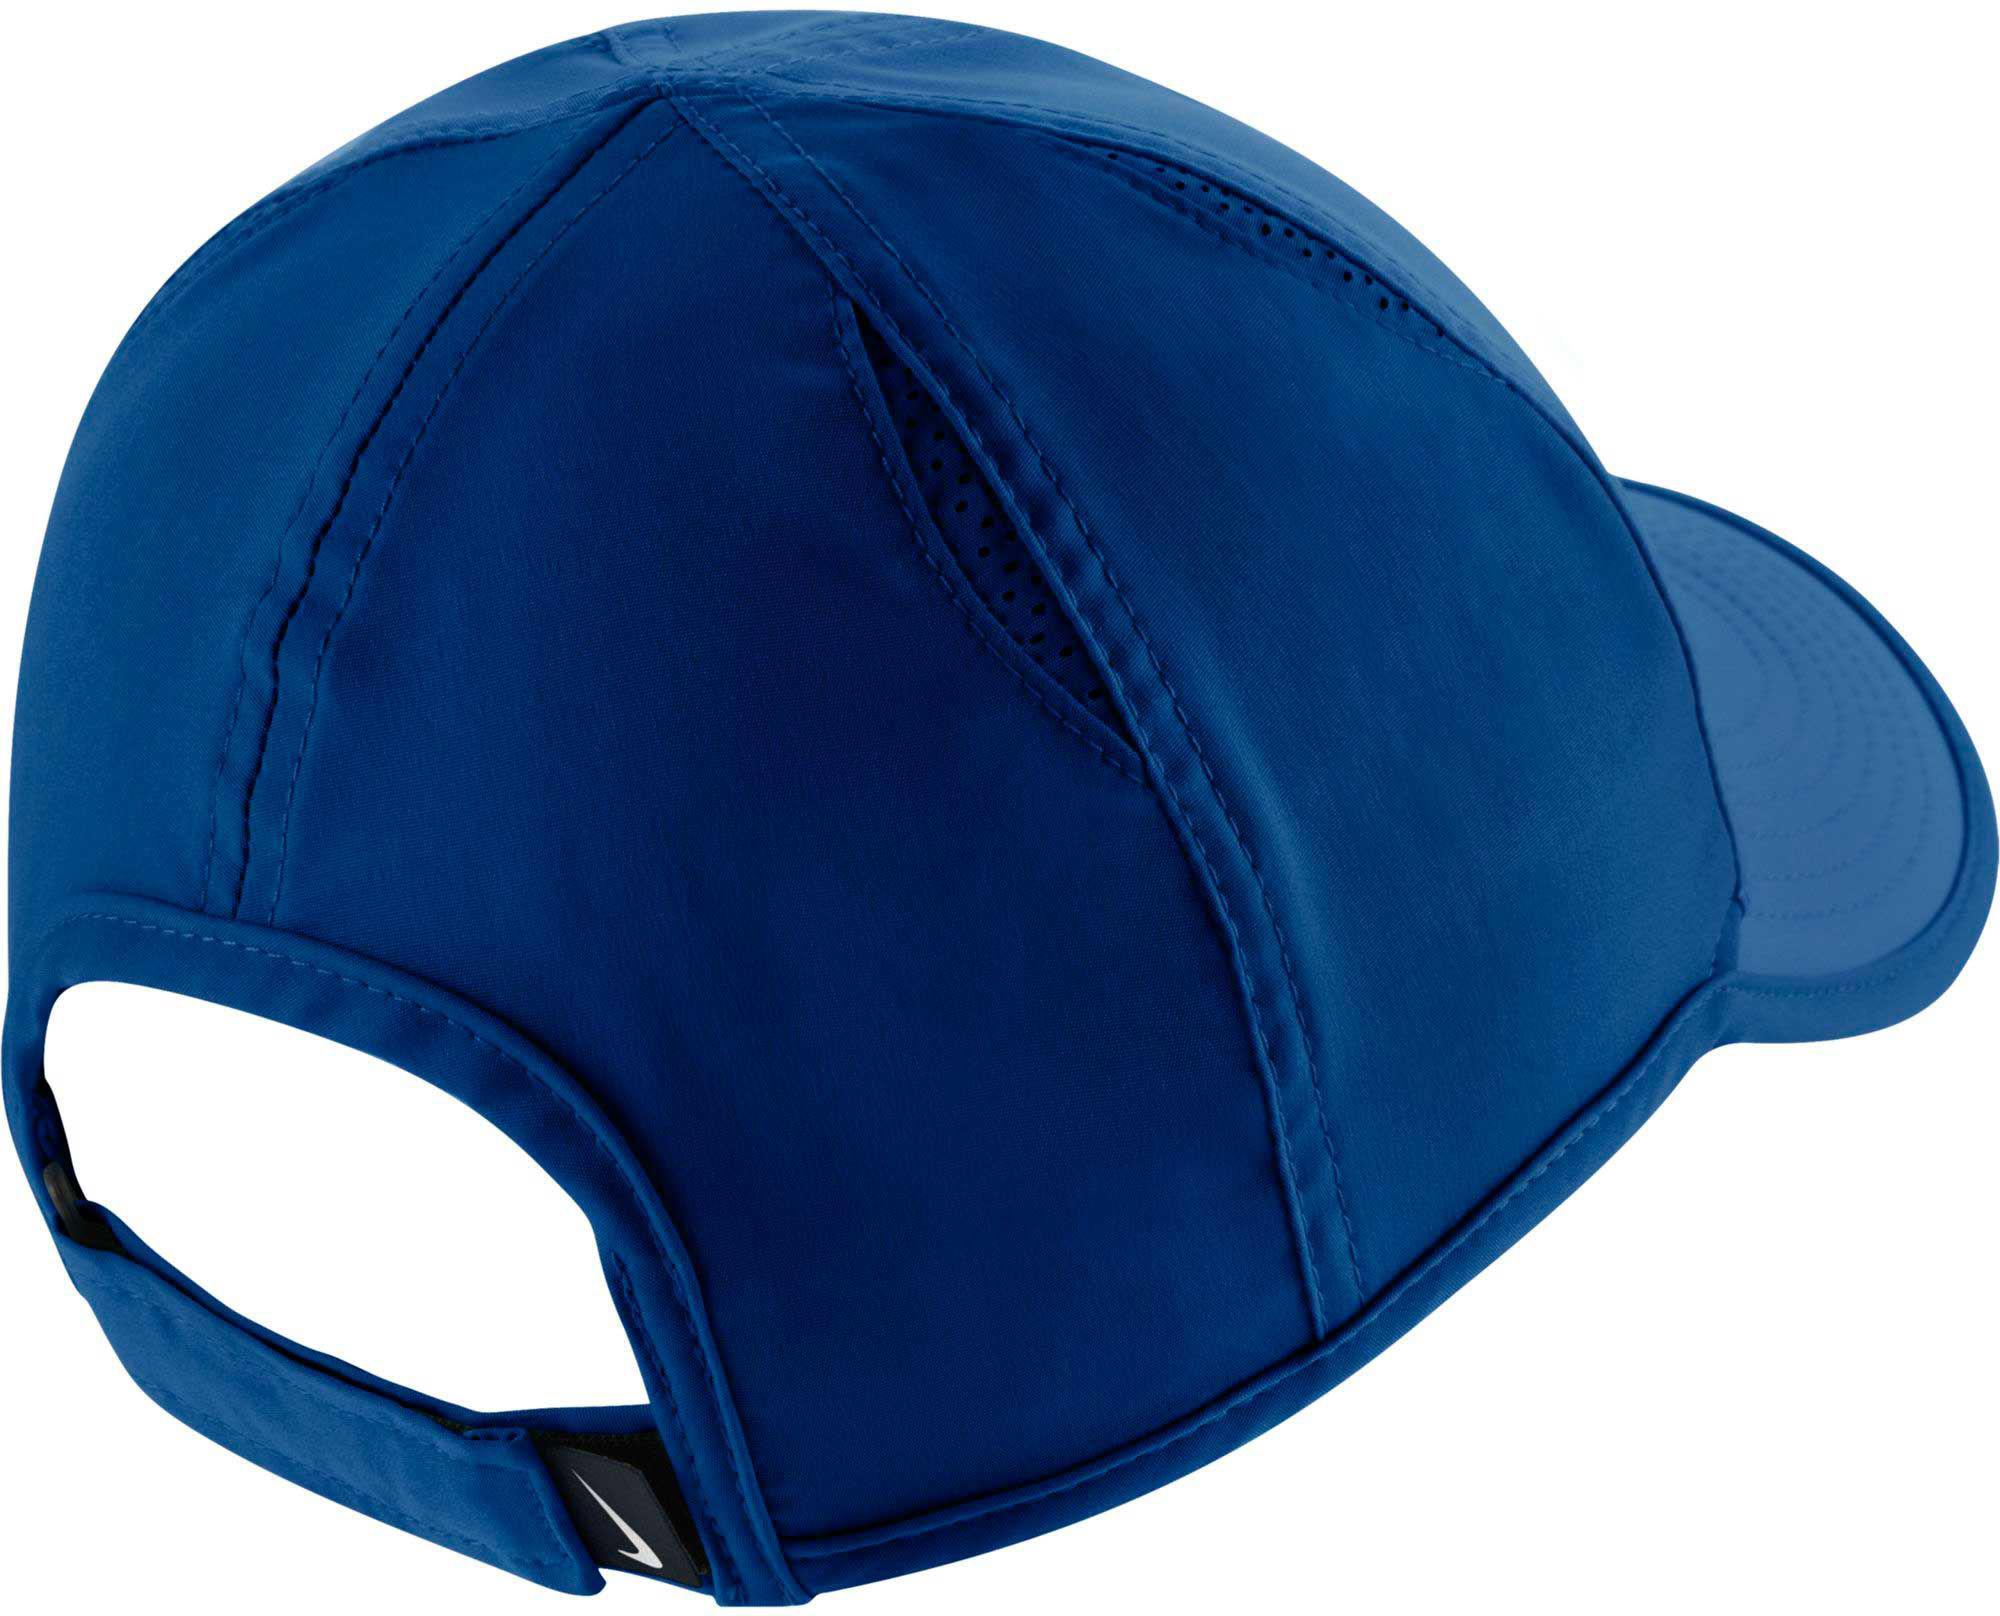 222d23140de Lyst - Nike Feather Light Adjustable Hat in Blue